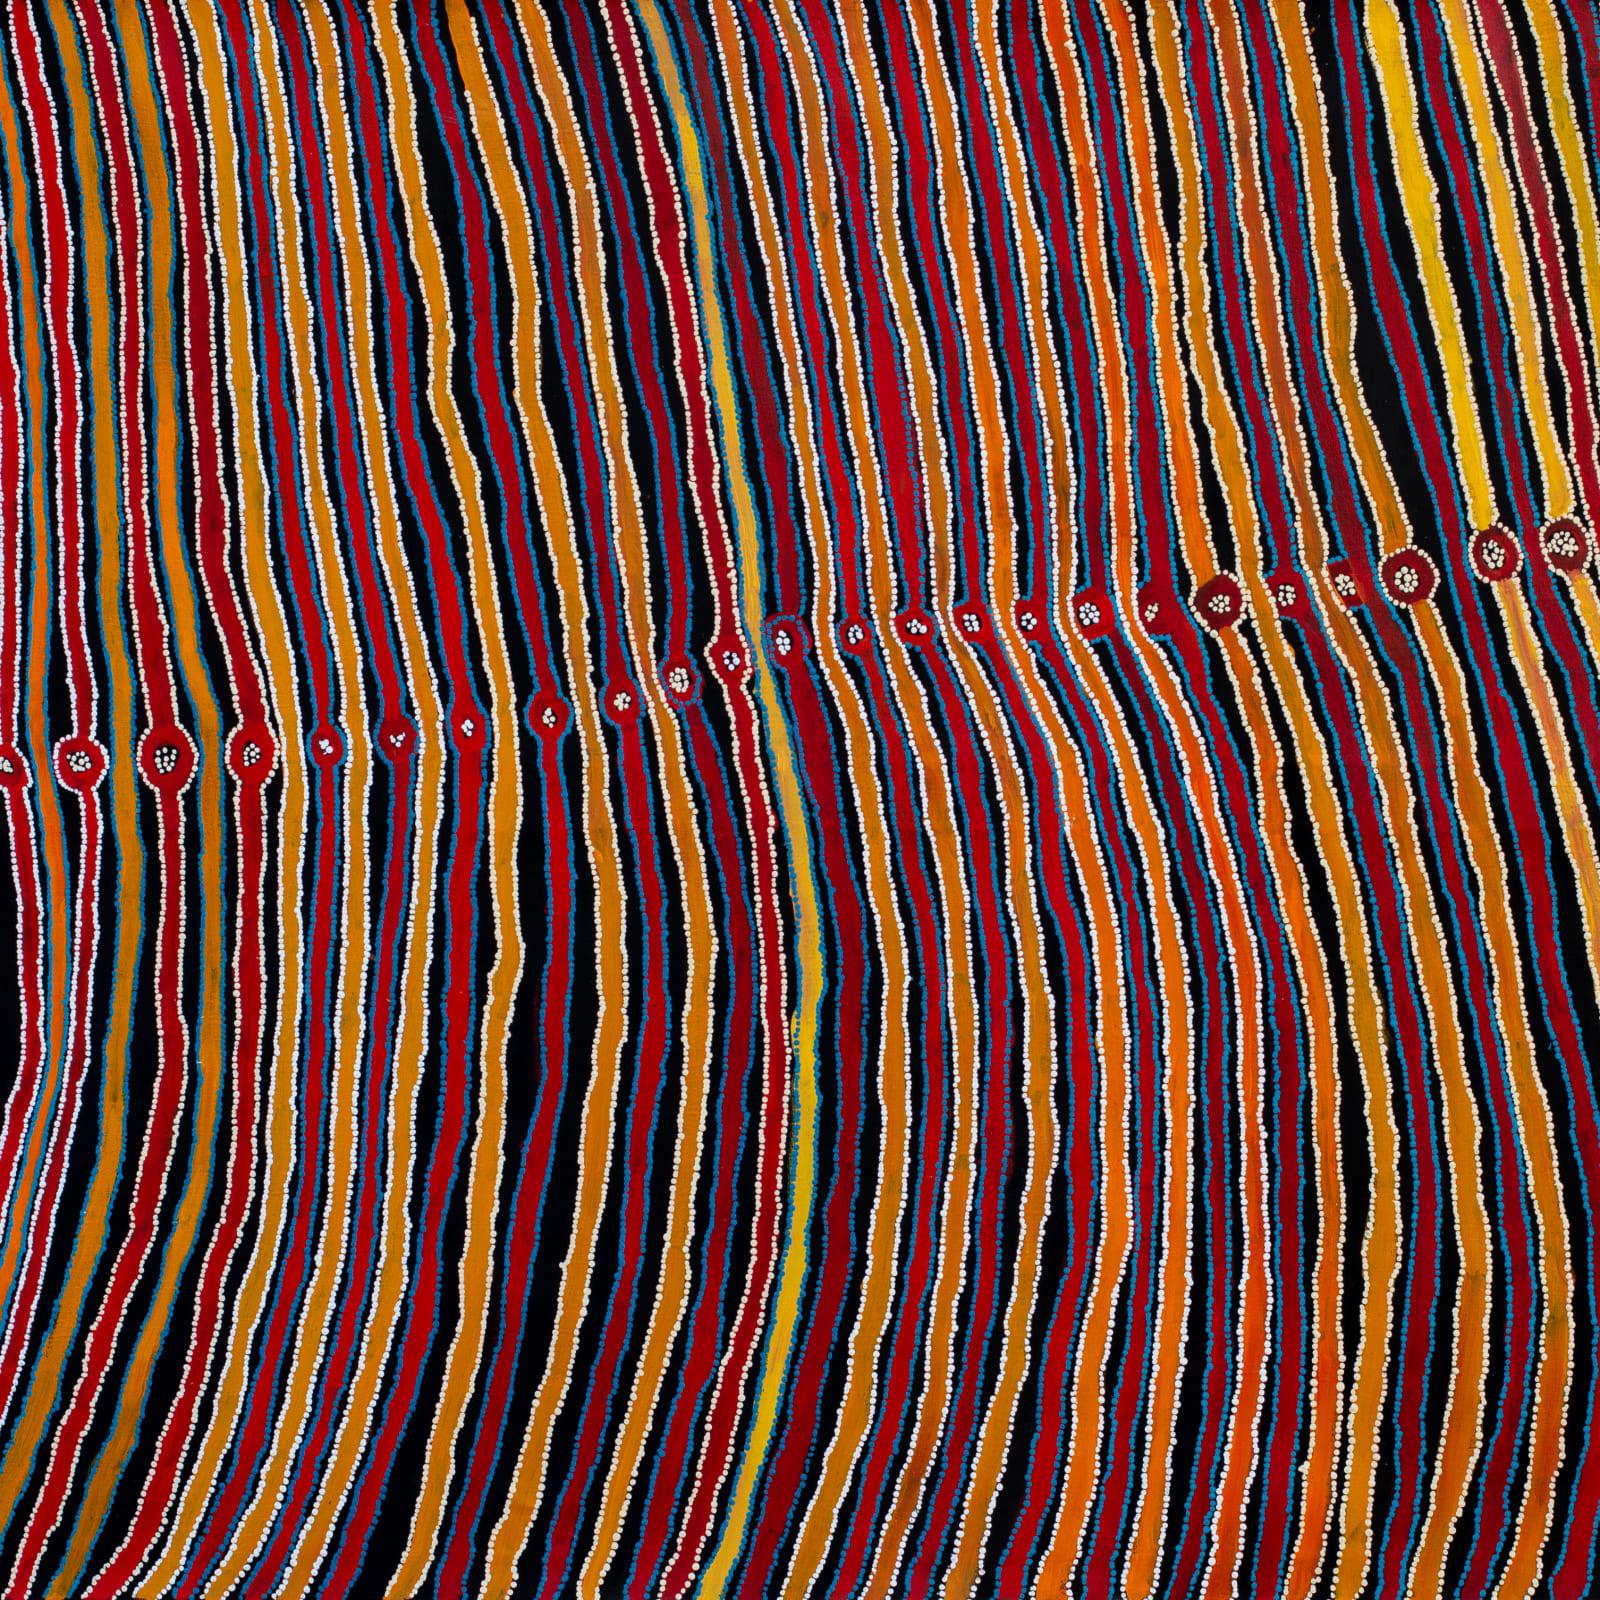 Lennard Walker  Tali, 2019  Acrylic on linen  200 x 137 cm